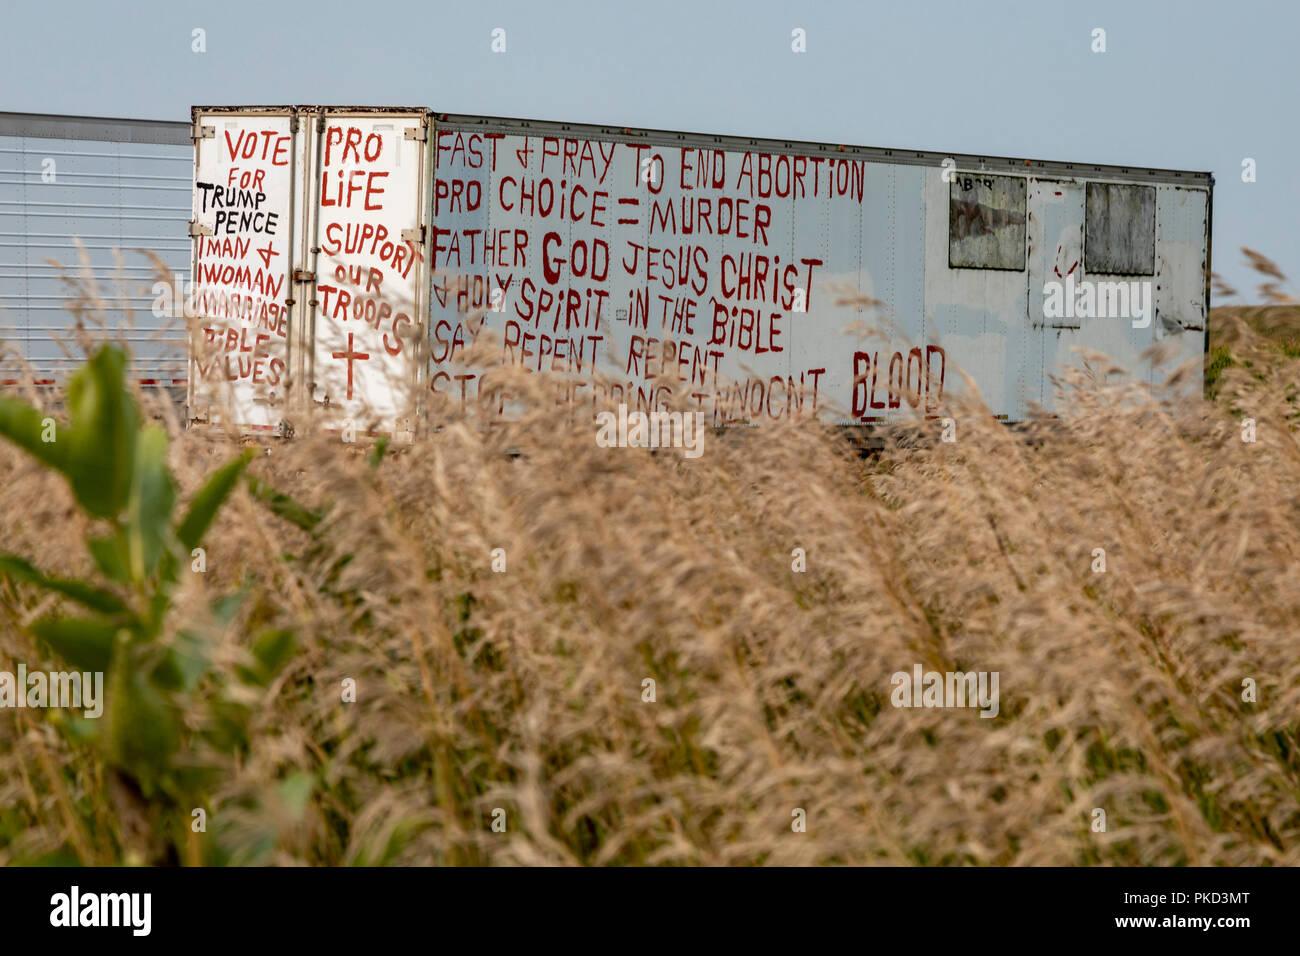 Dixon, Nebraska - A trailer on an eastern Nebraska farm carries the political opinions of the resident. - Stock Image